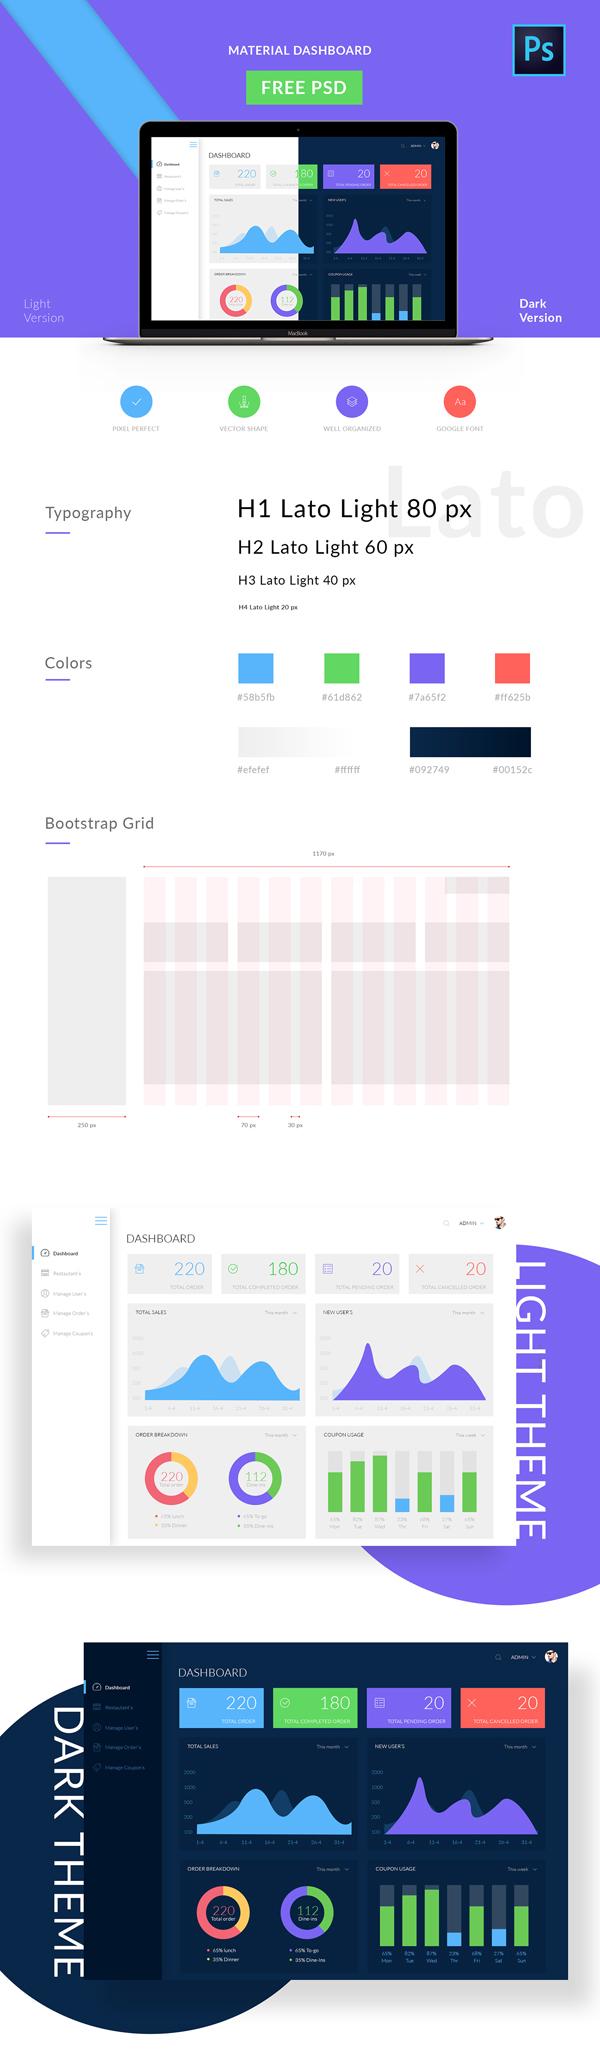 Free Material Dashboard (Light, Dark) UI Templates